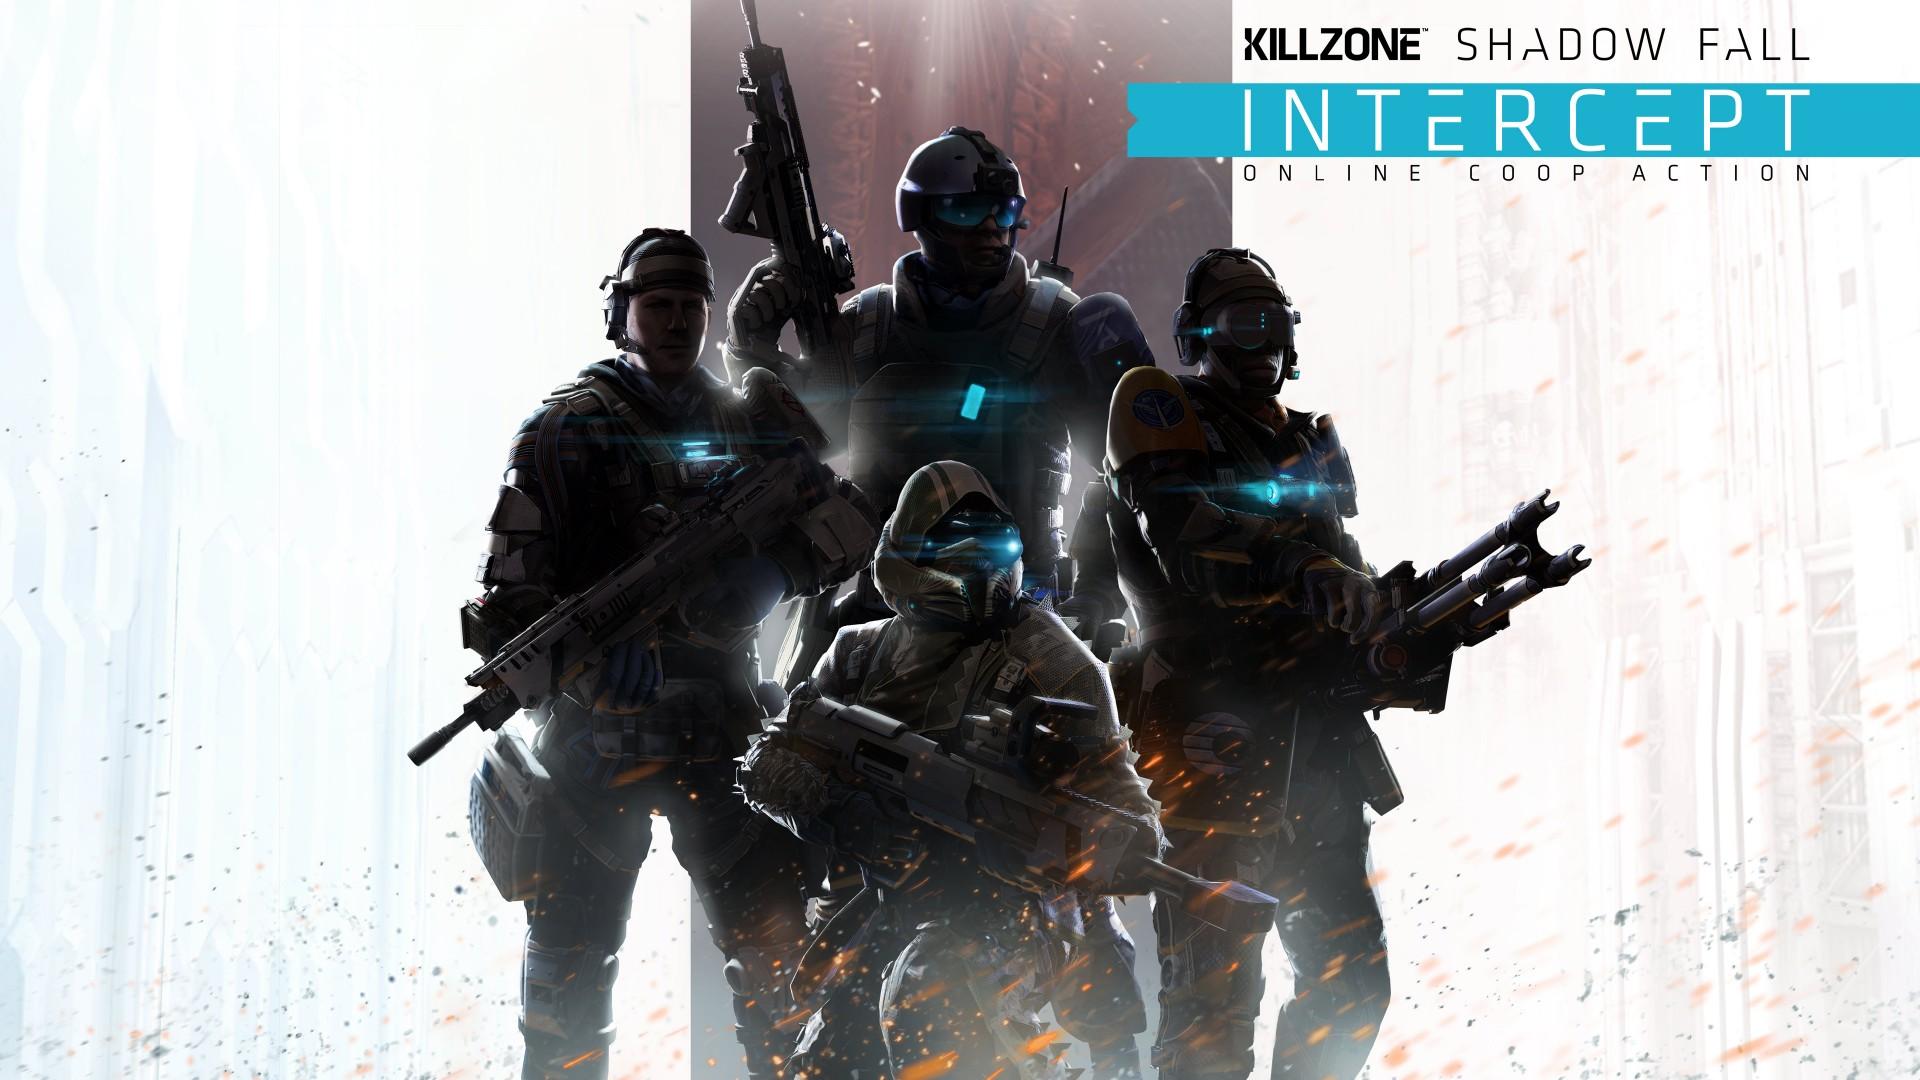 Killzone Shadow Fall Wallpaper Killzone Shadow Fall Intercept Game Wallpapers Hd